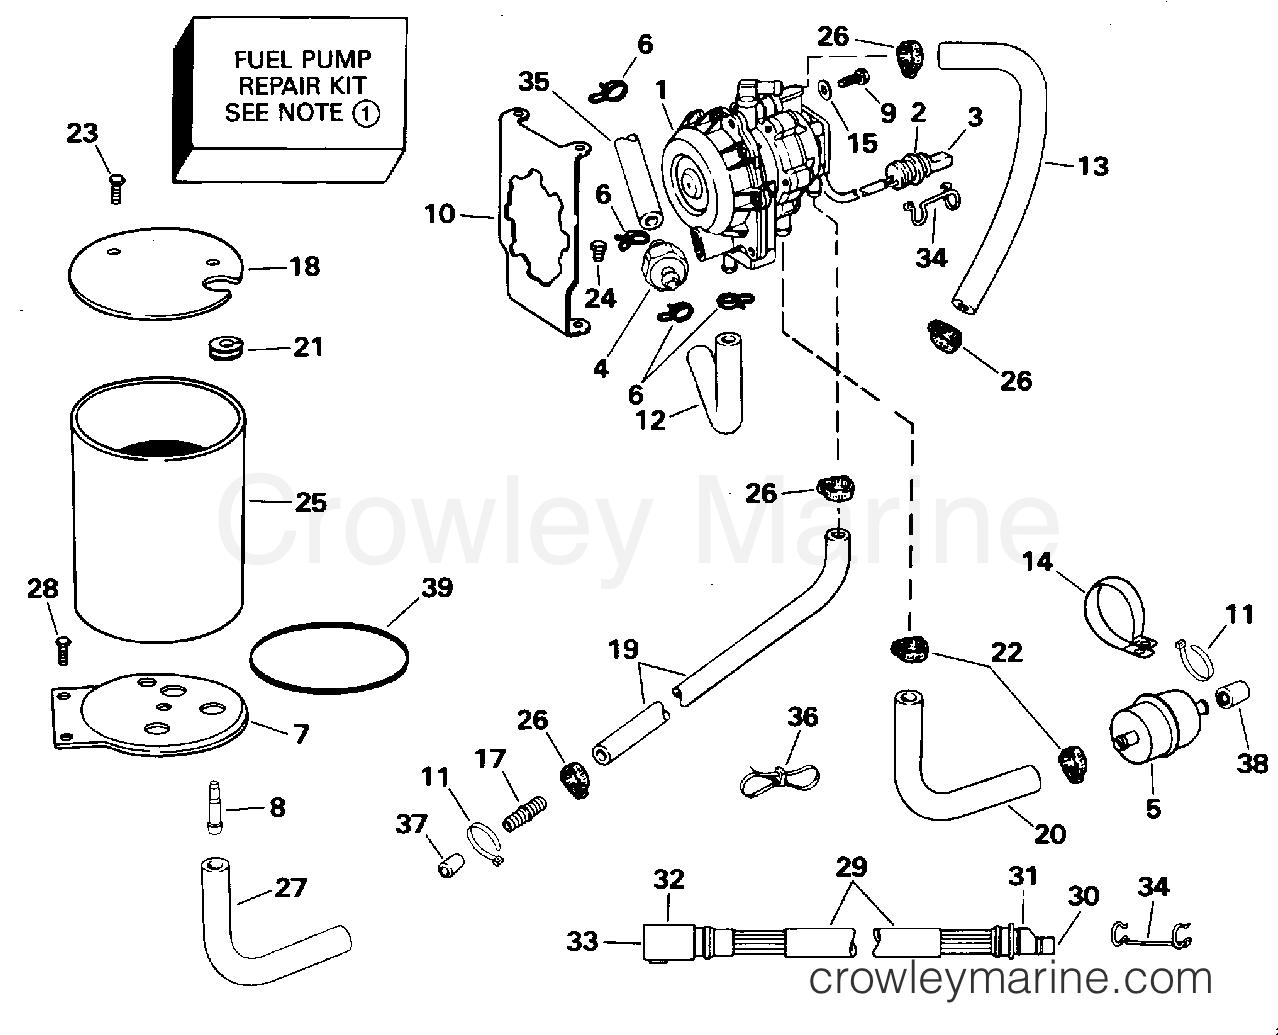 omc fuel pump diagram product wiring diagrams u2022 rh genesisventures us Light Switch Wiring Diagram Wiring Diagram Symbols